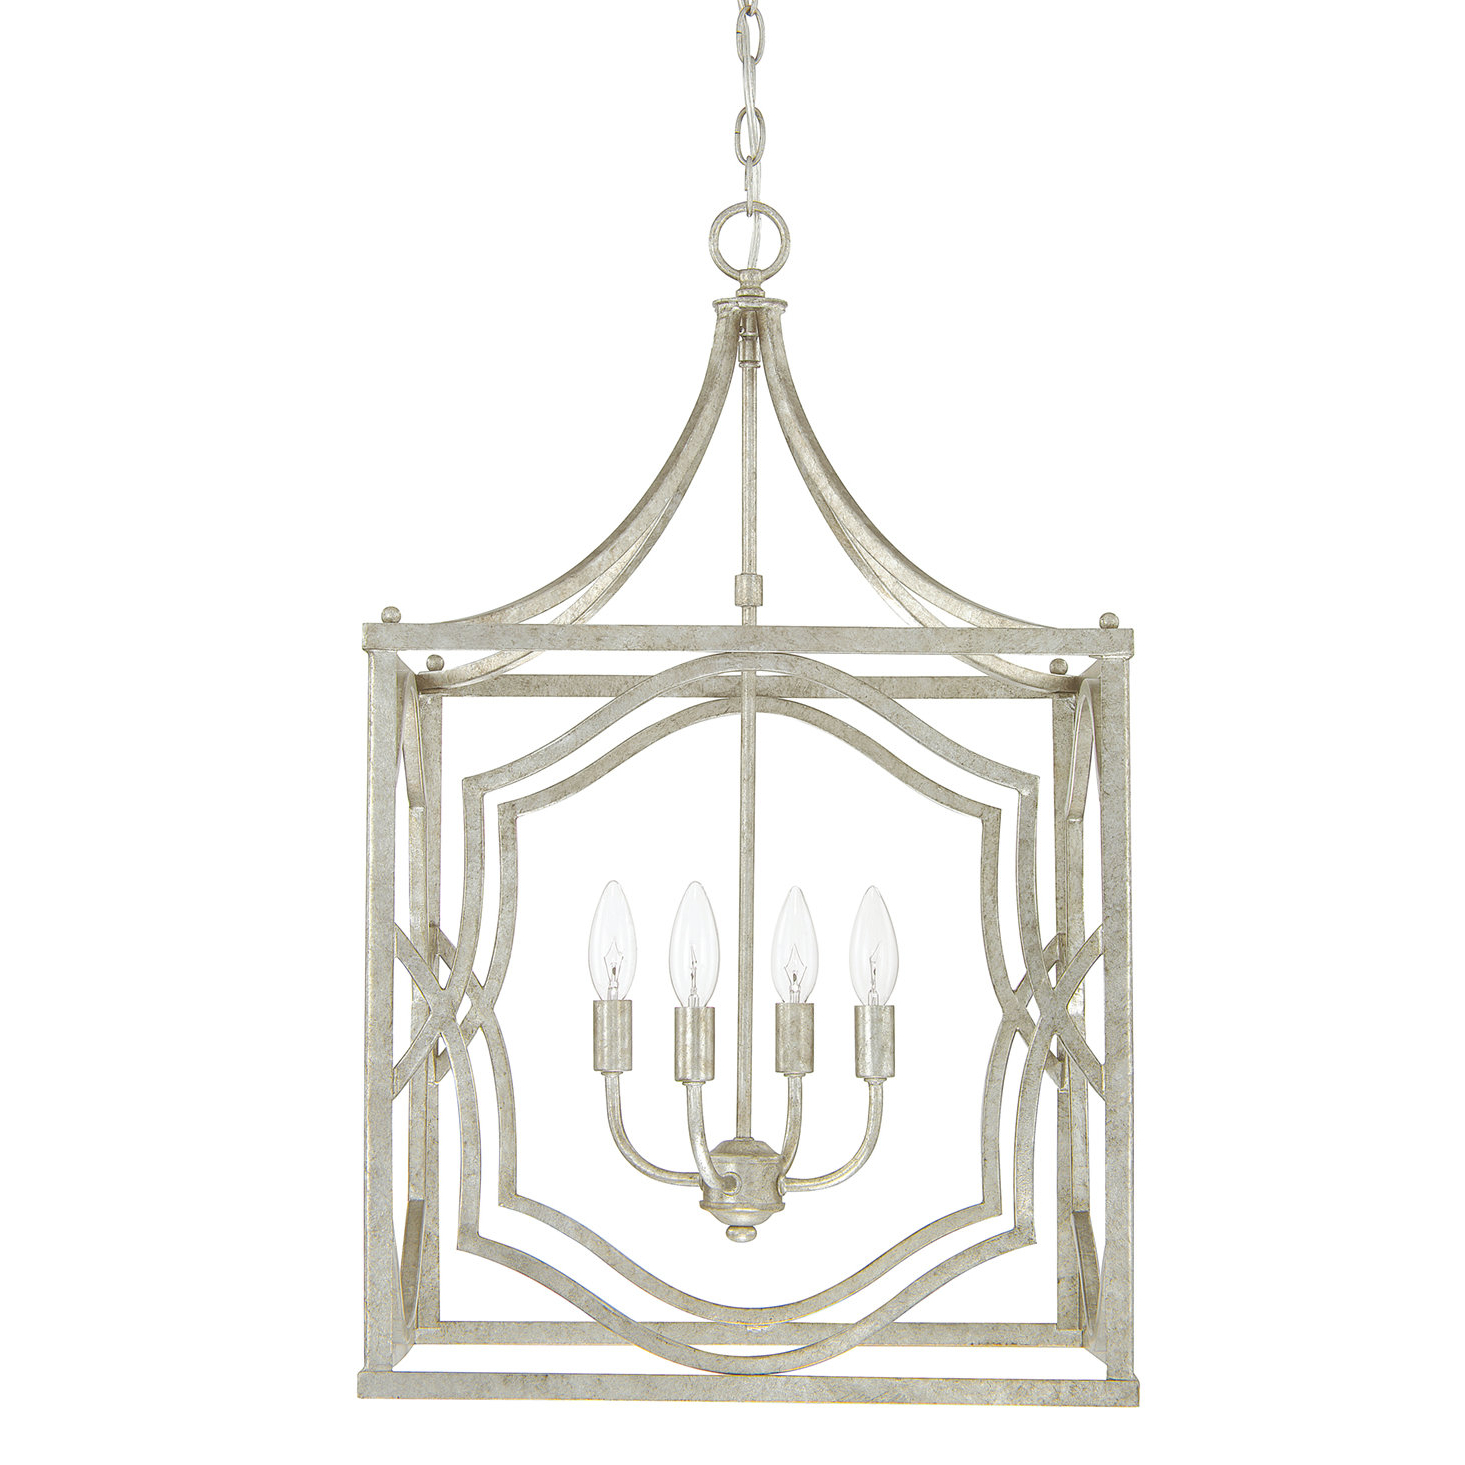 Latest Destrey 4 Light Lantern Square / Rectangle Pendant Regarding Freeburg 4 Light Lantern Square / Rectangle Pendants (View 10 of 20)